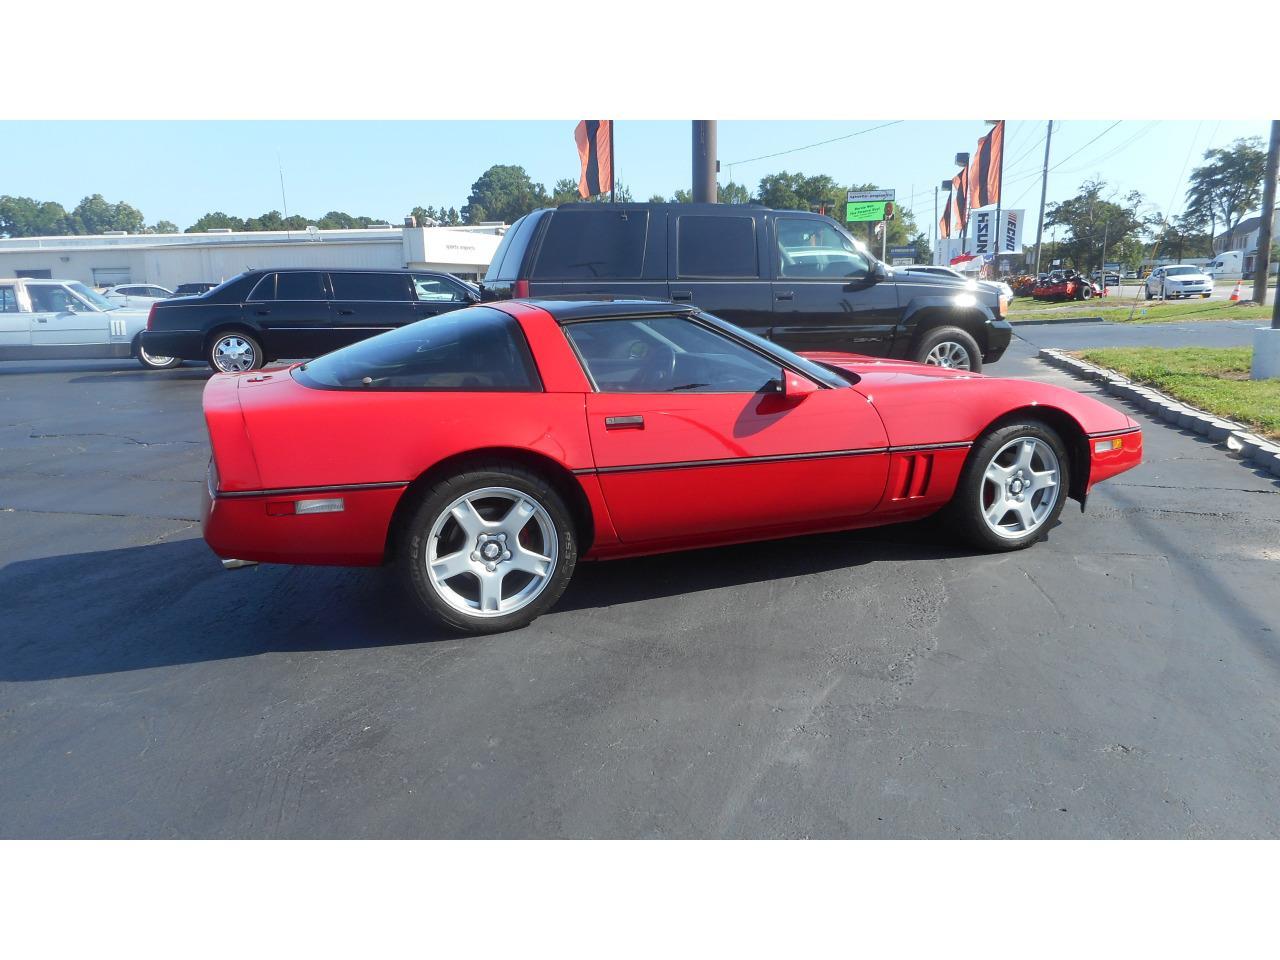 Large Picture of 1985 Corvette located in Greenville North Carolina - $6,999.00 - QI76